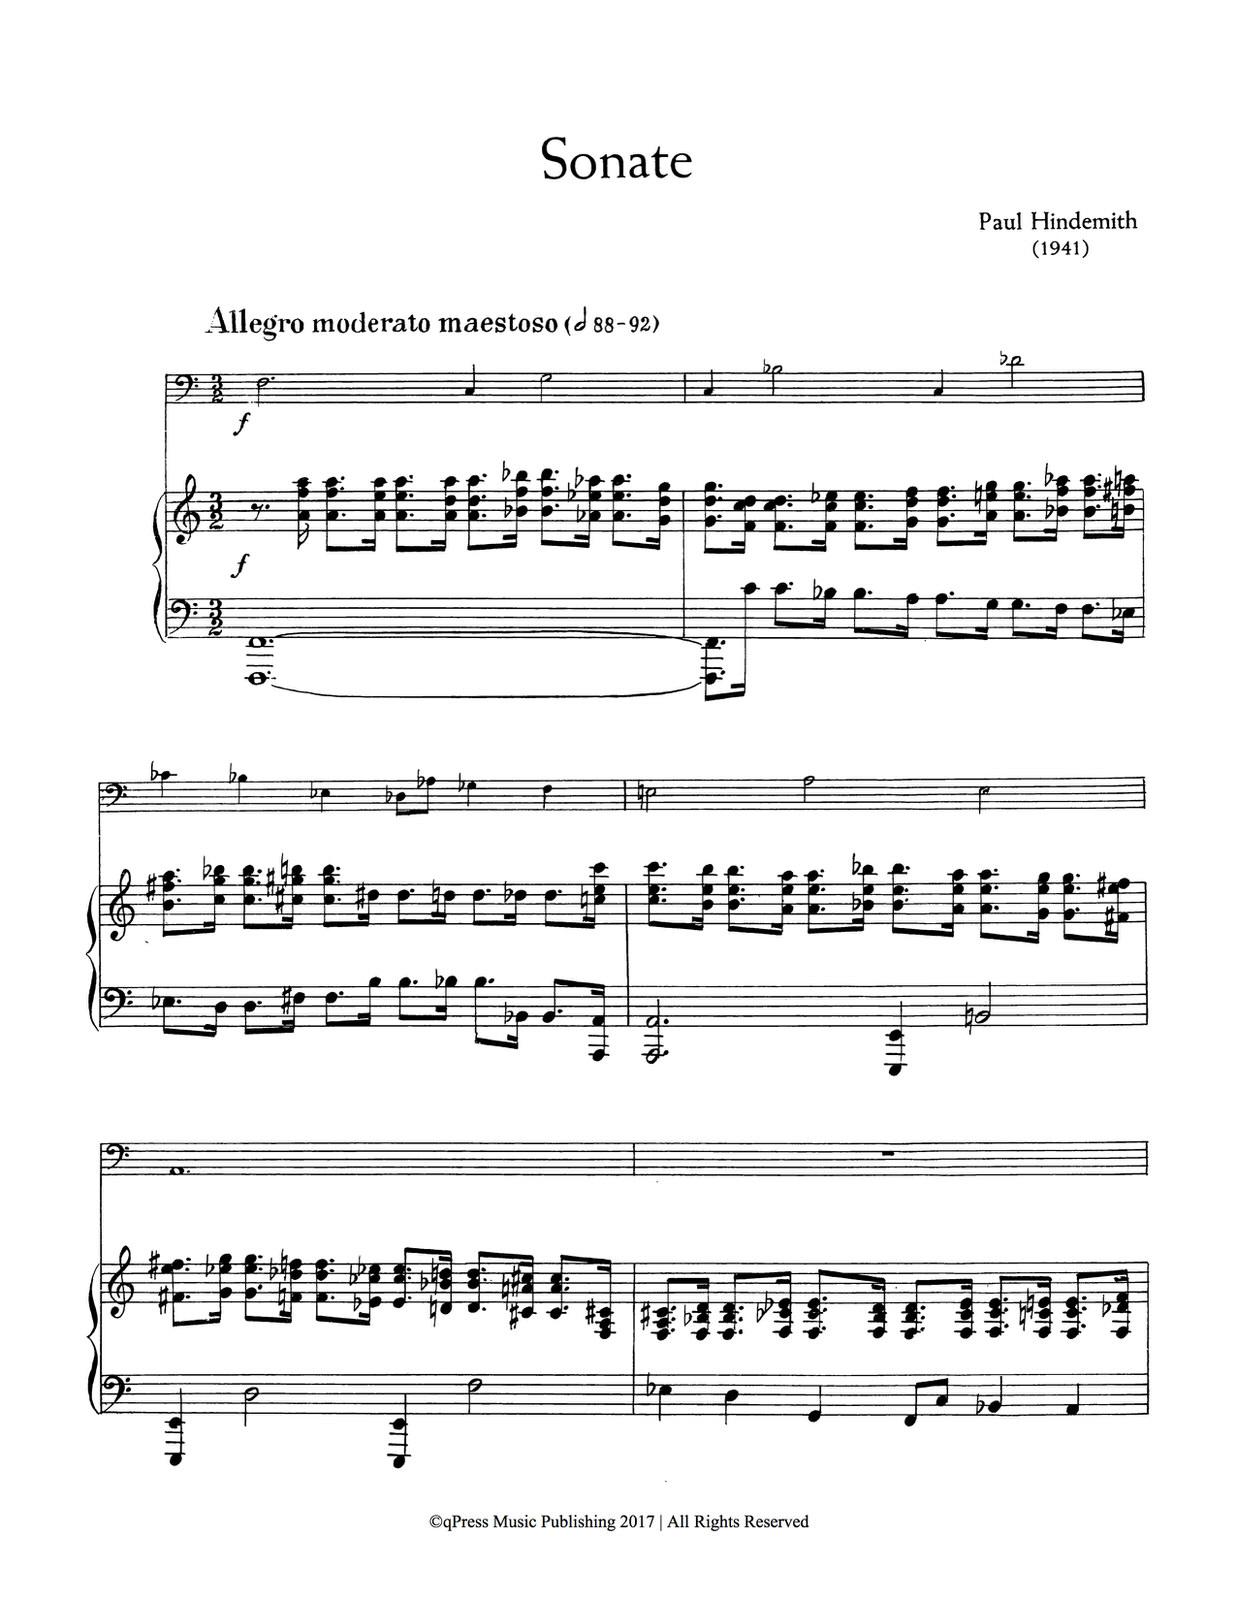 hindemith-sonata-for-trombone-complete-3